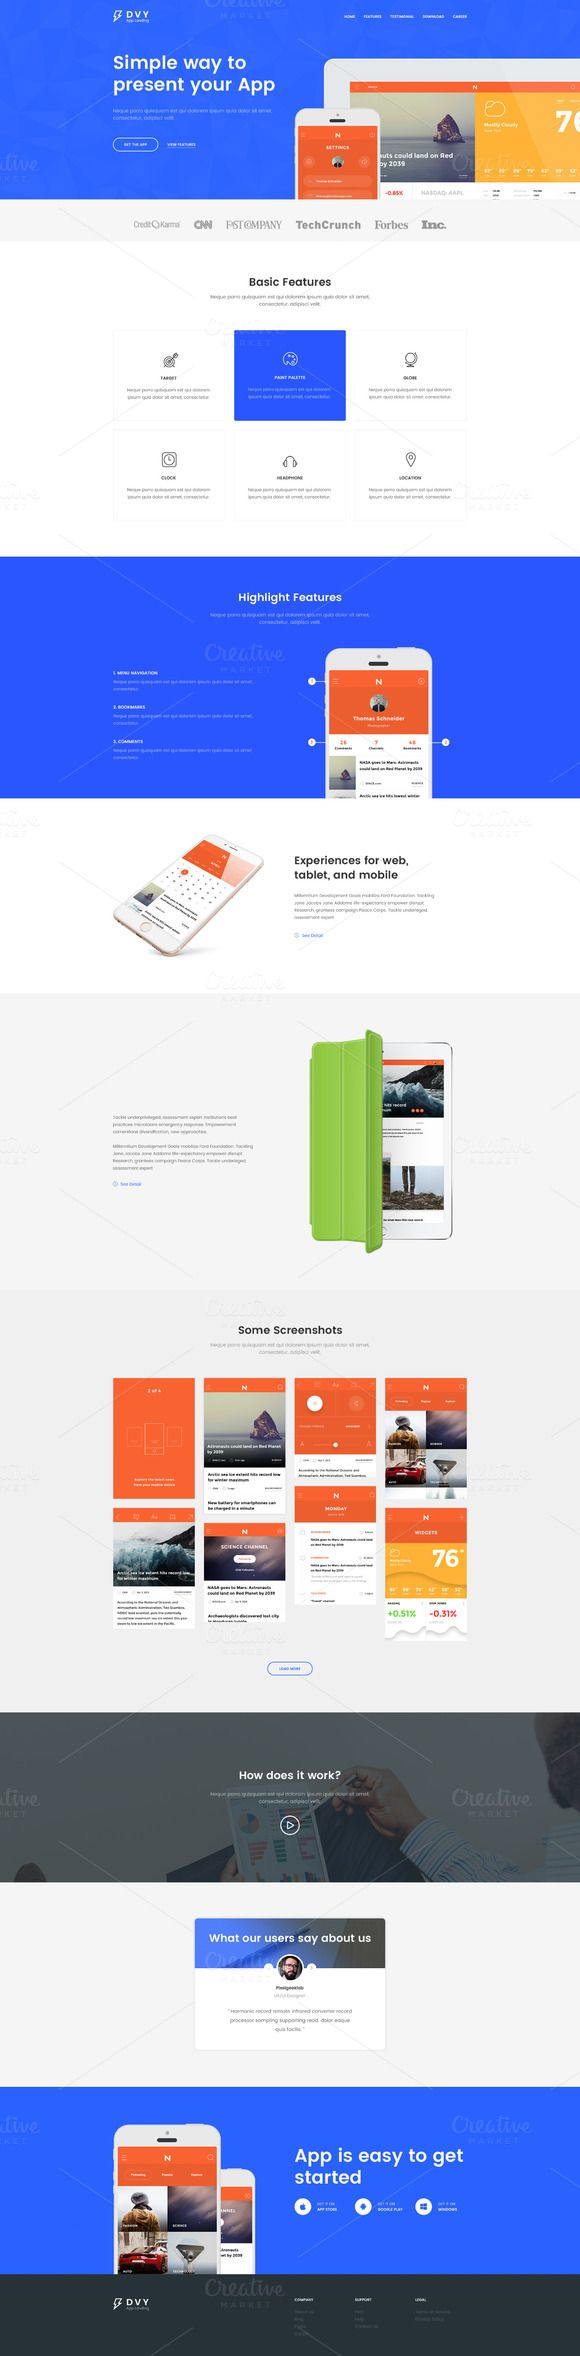 DVY App Landing Page PSD Template by pixelgeeklab on Creative Market